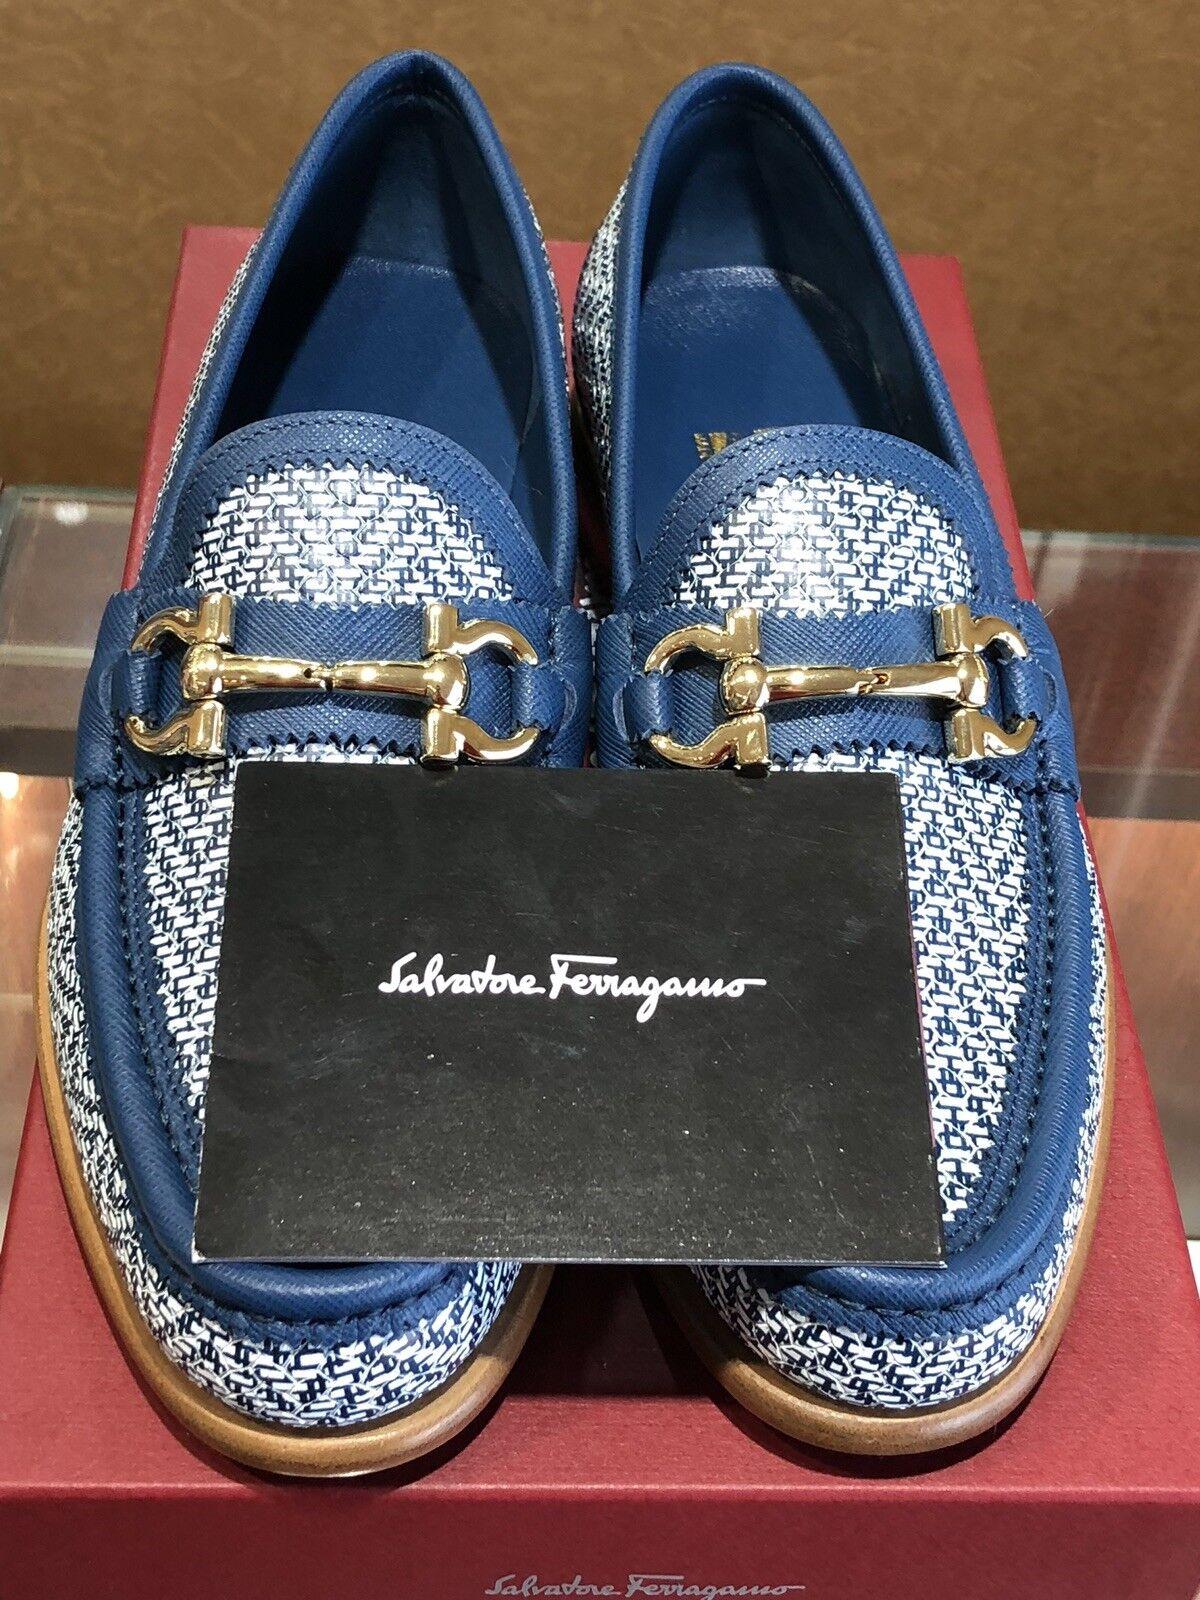 Salvatore Ferragamo Mason Twist 1 Cm Heal Women shoes Size 7.5